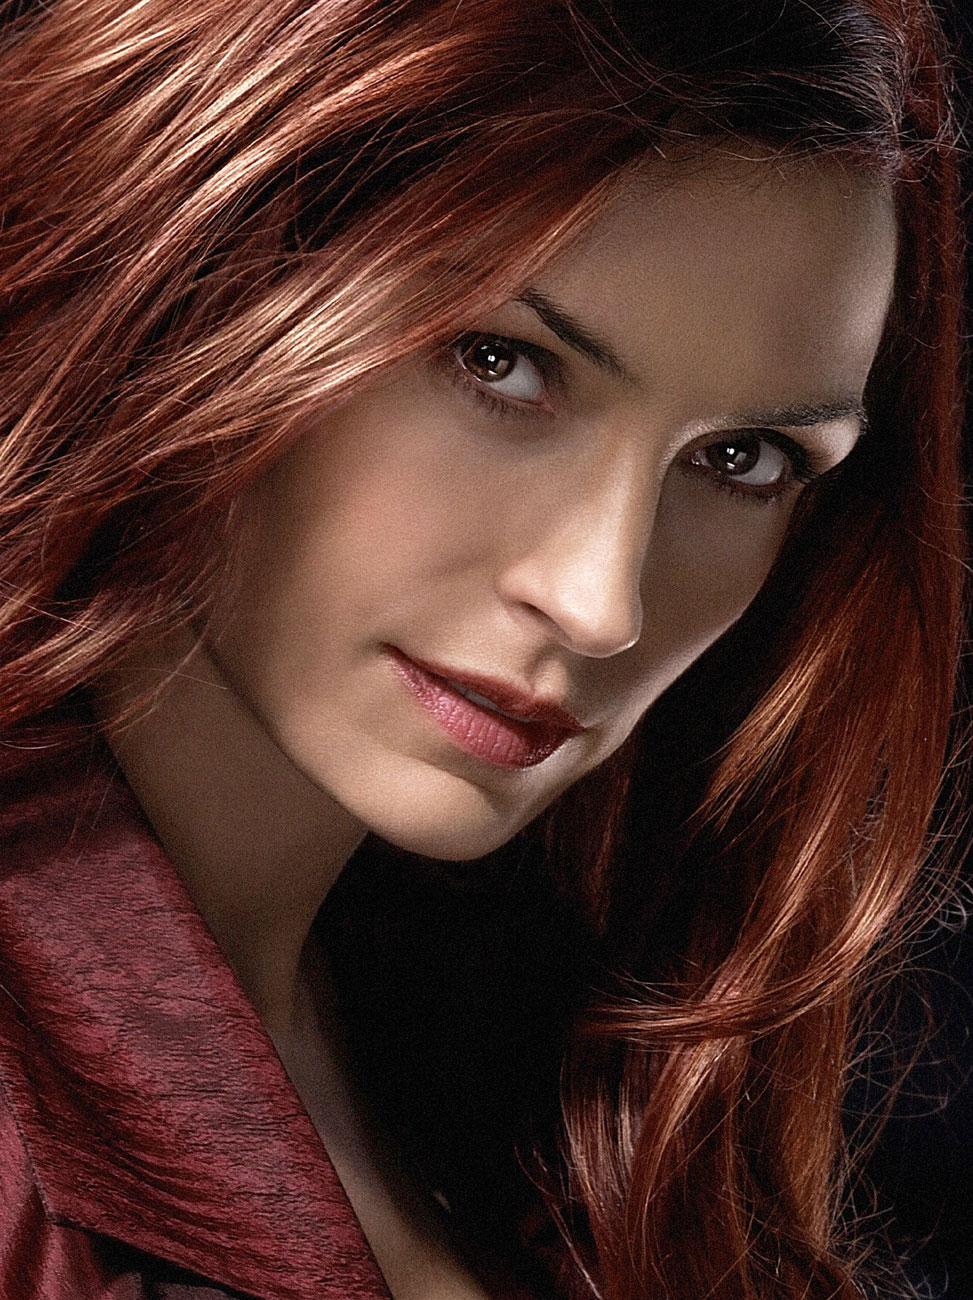 Jane Grey (actress) Jane Grey (actress) new picture